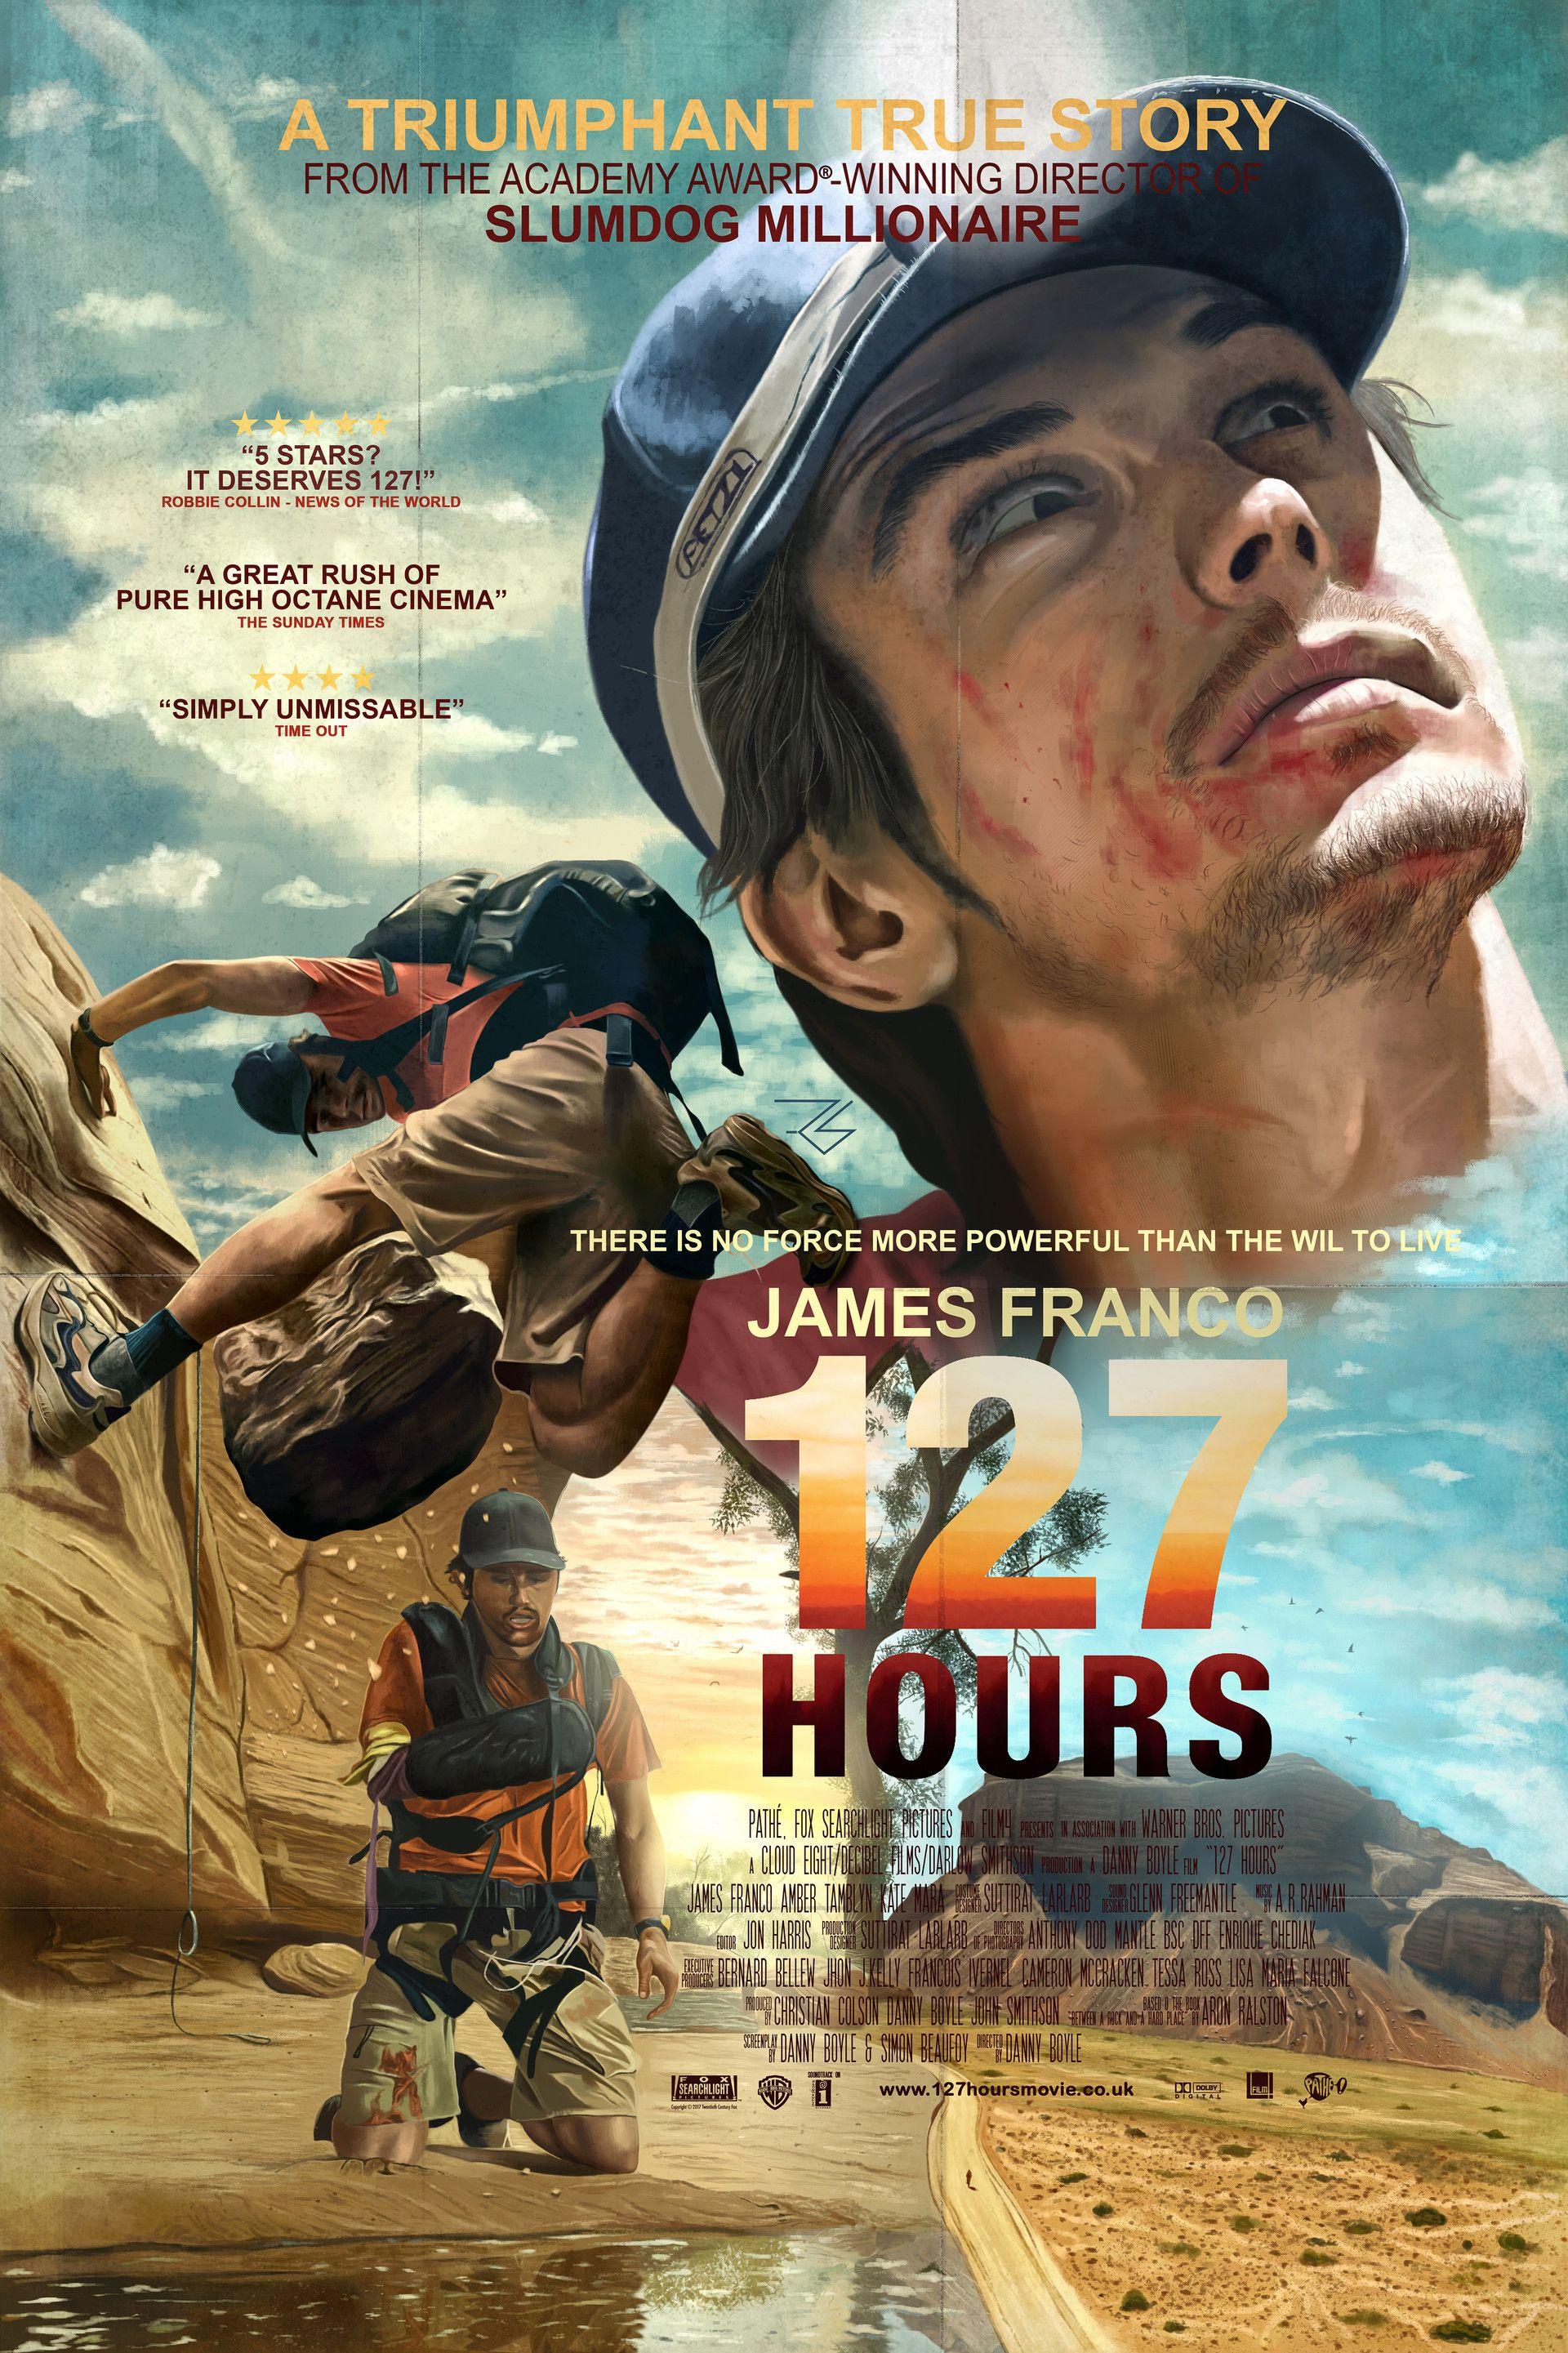 Rick Sanliz 127 Hours Poster Movie Movies To Watch Hindi Inspirational Movies Suspense Movies